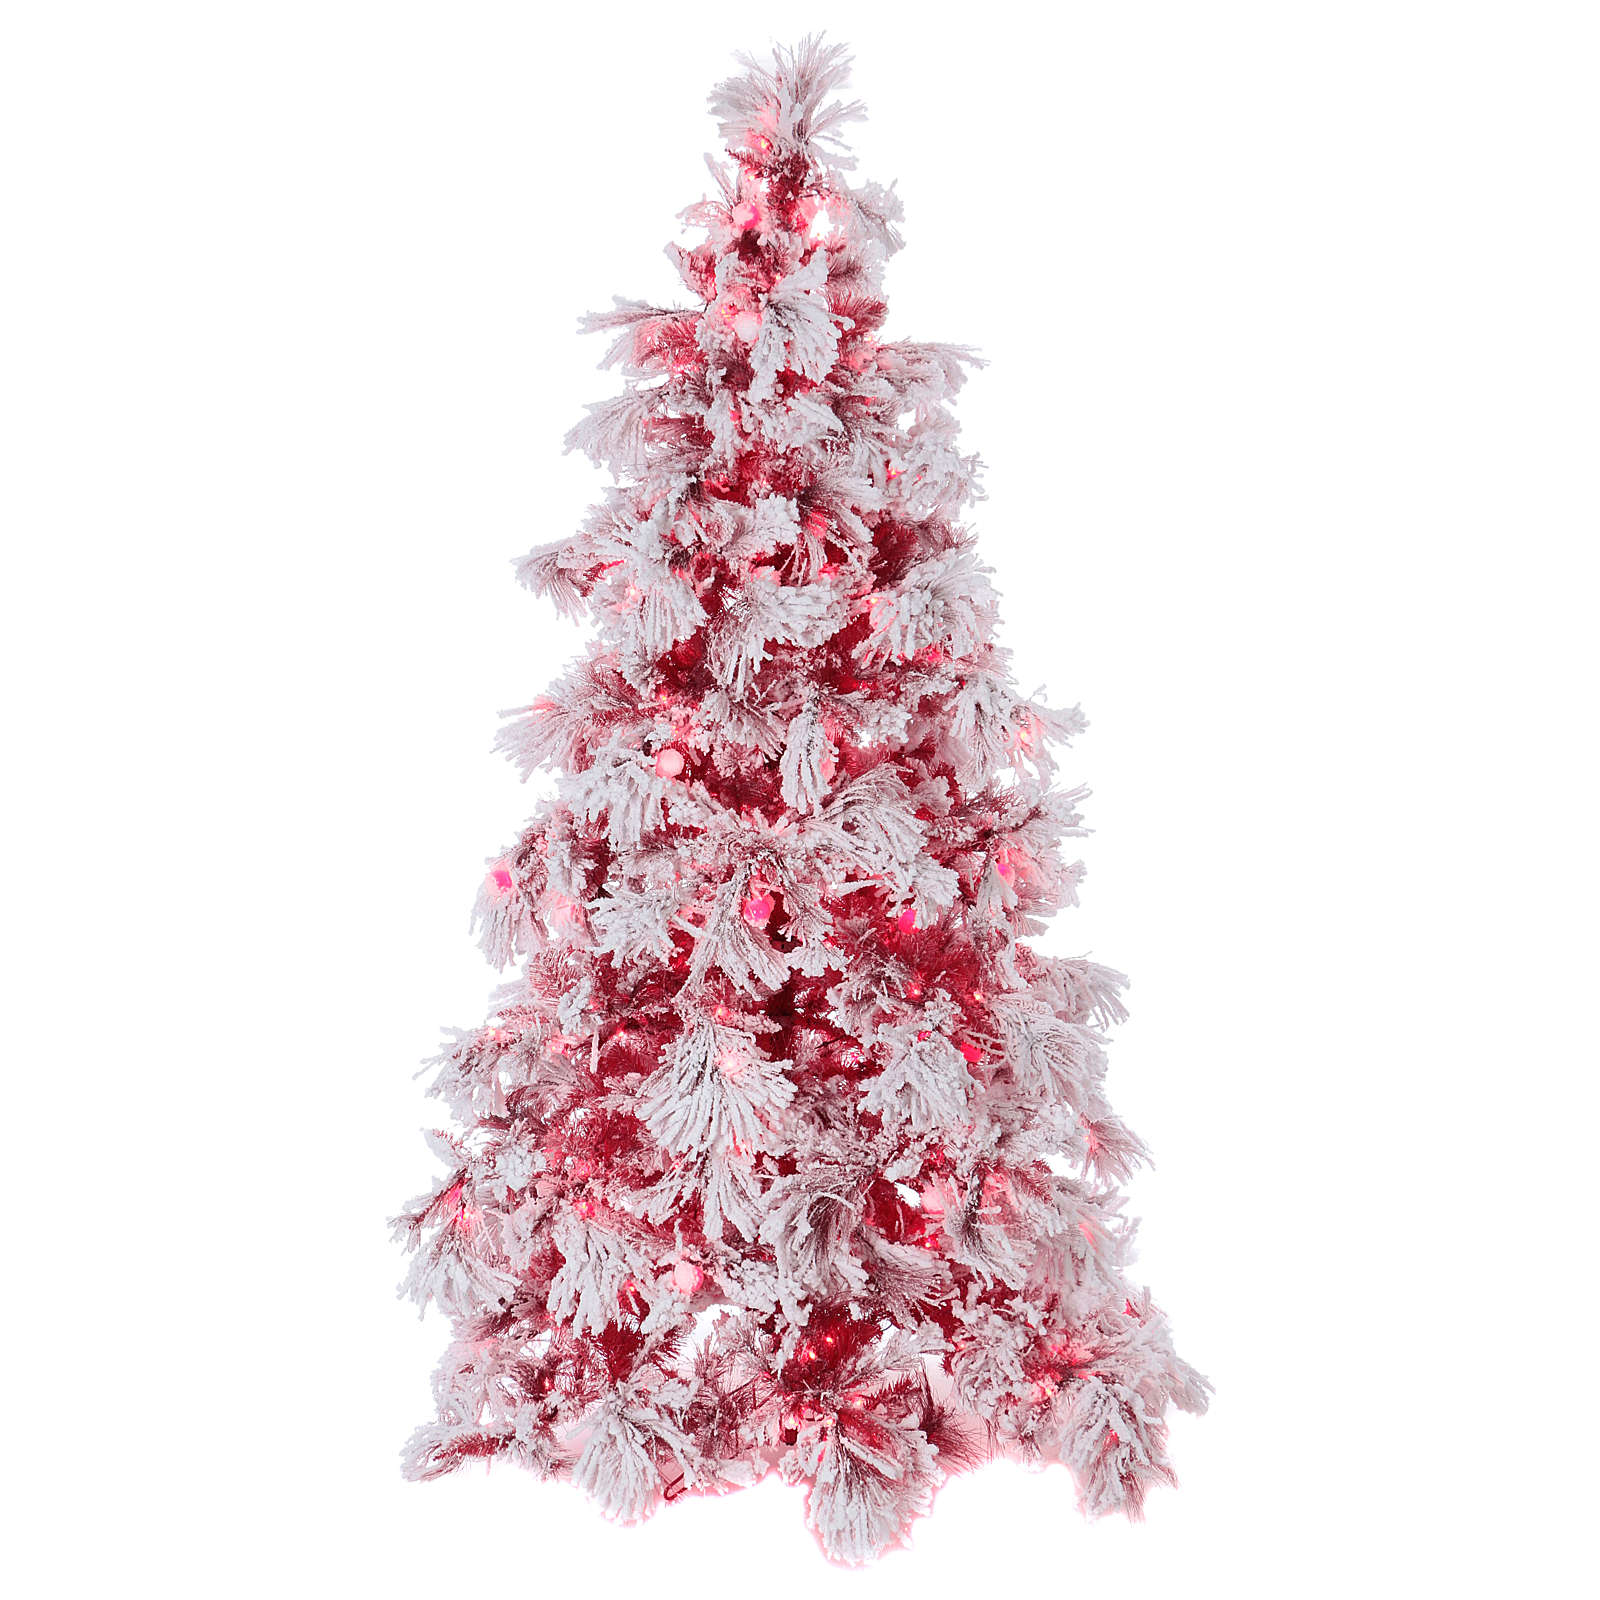 Albero di Natale 230 cm Red Velvet abete innevato 500 luci led uso interno 3